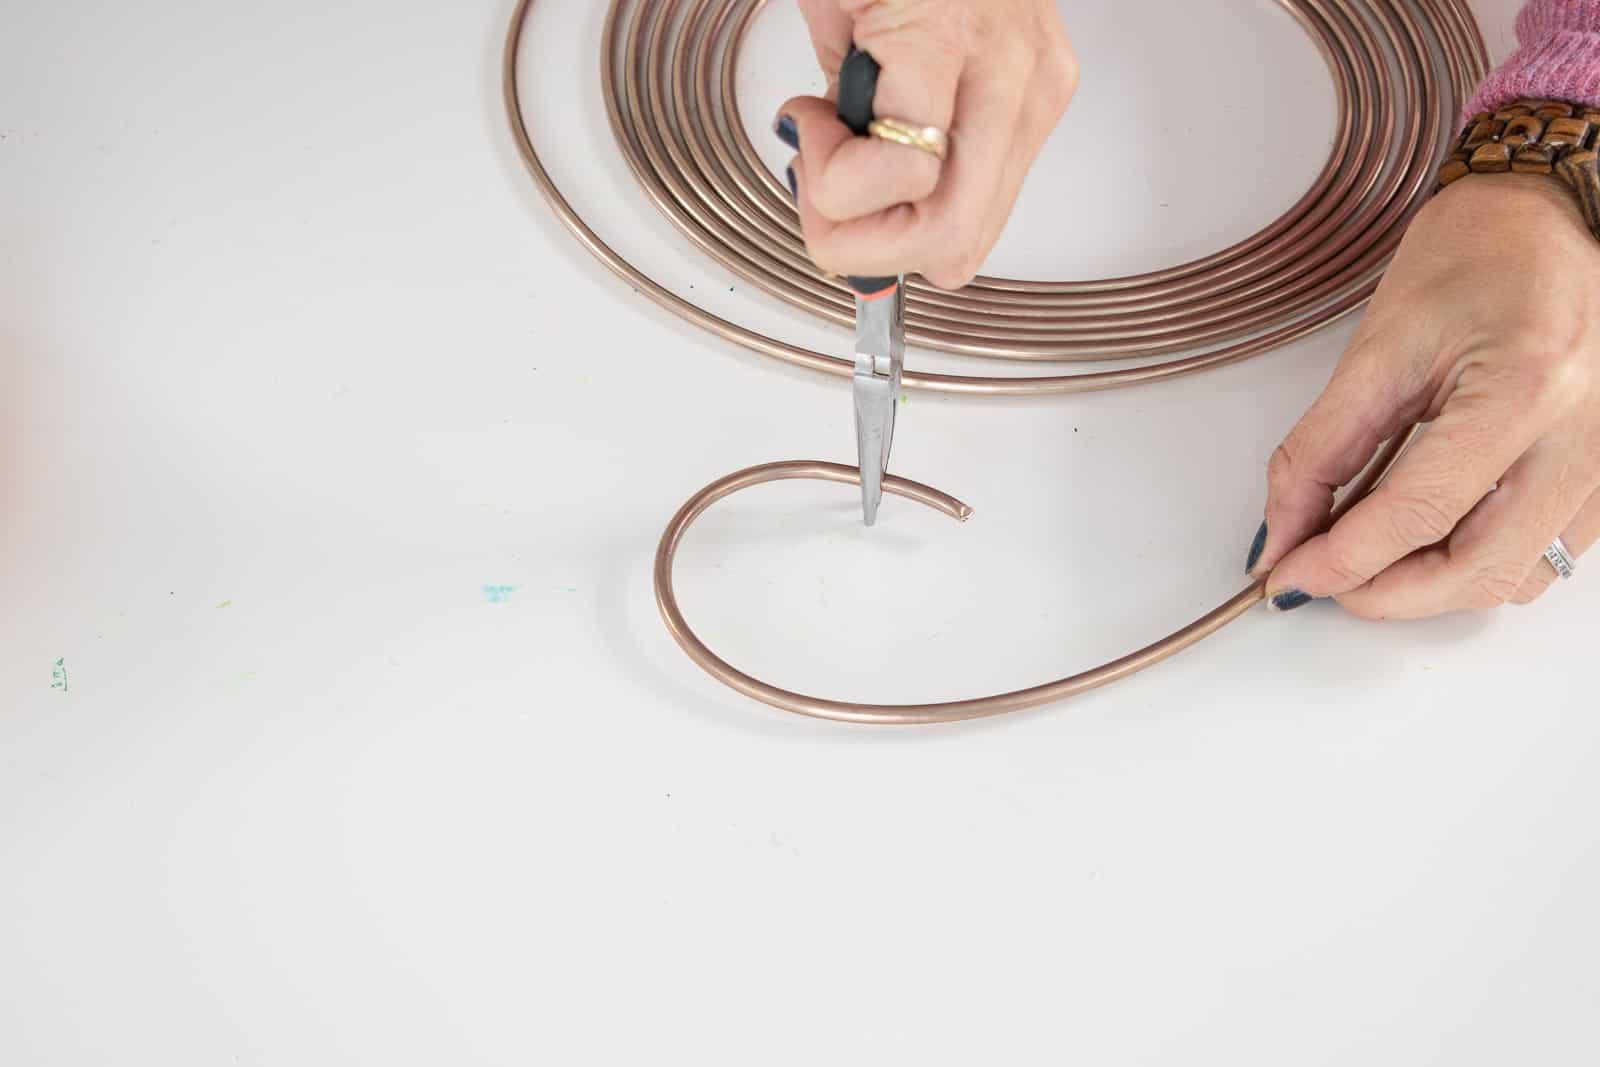 bend copper into a circle